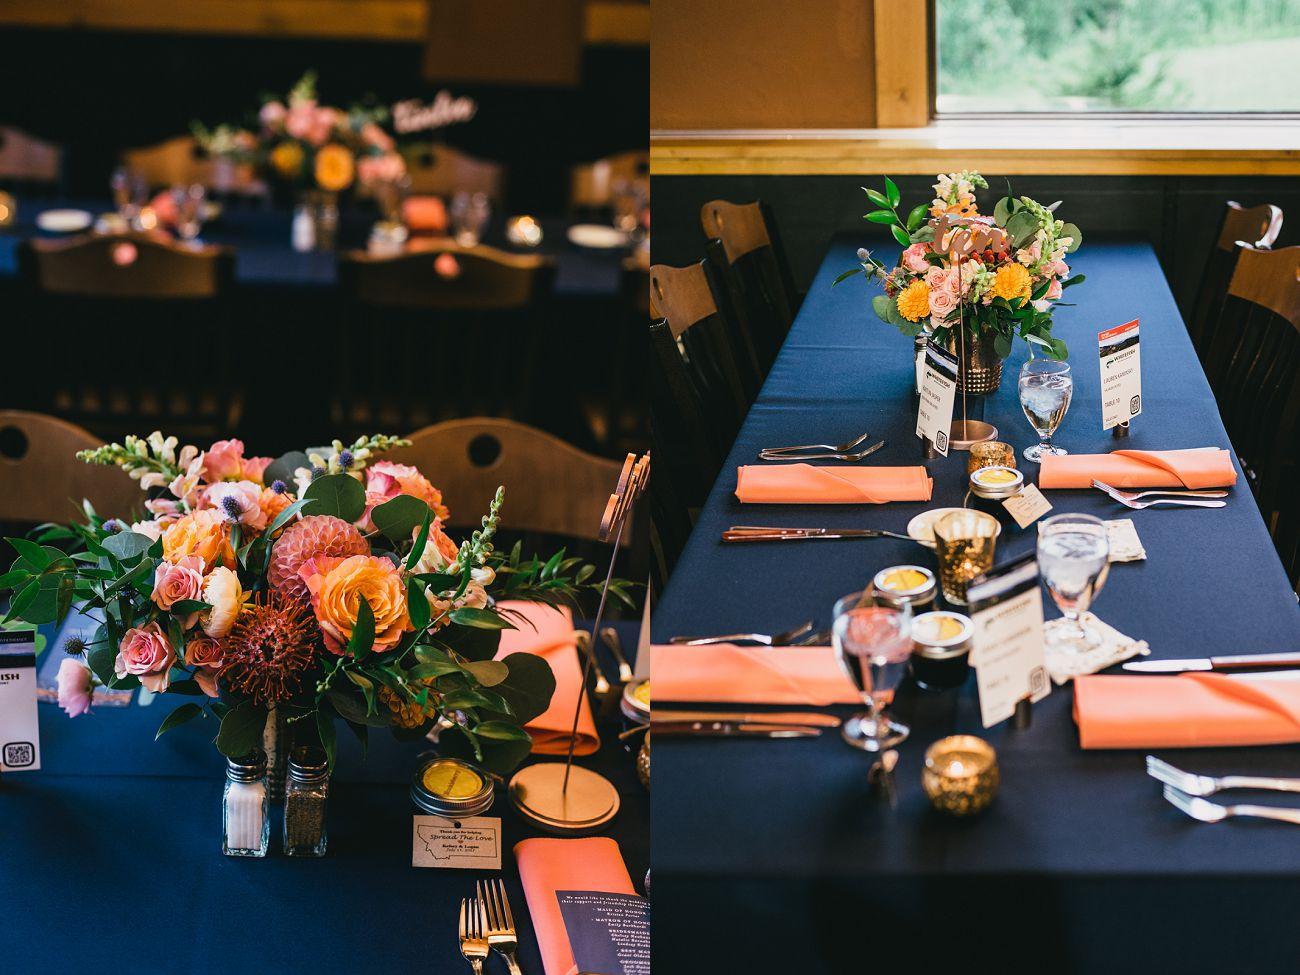 Jennifer_Mooney_Photo_Whitefish_Mountain_Resort_Wedding_00114.jpg